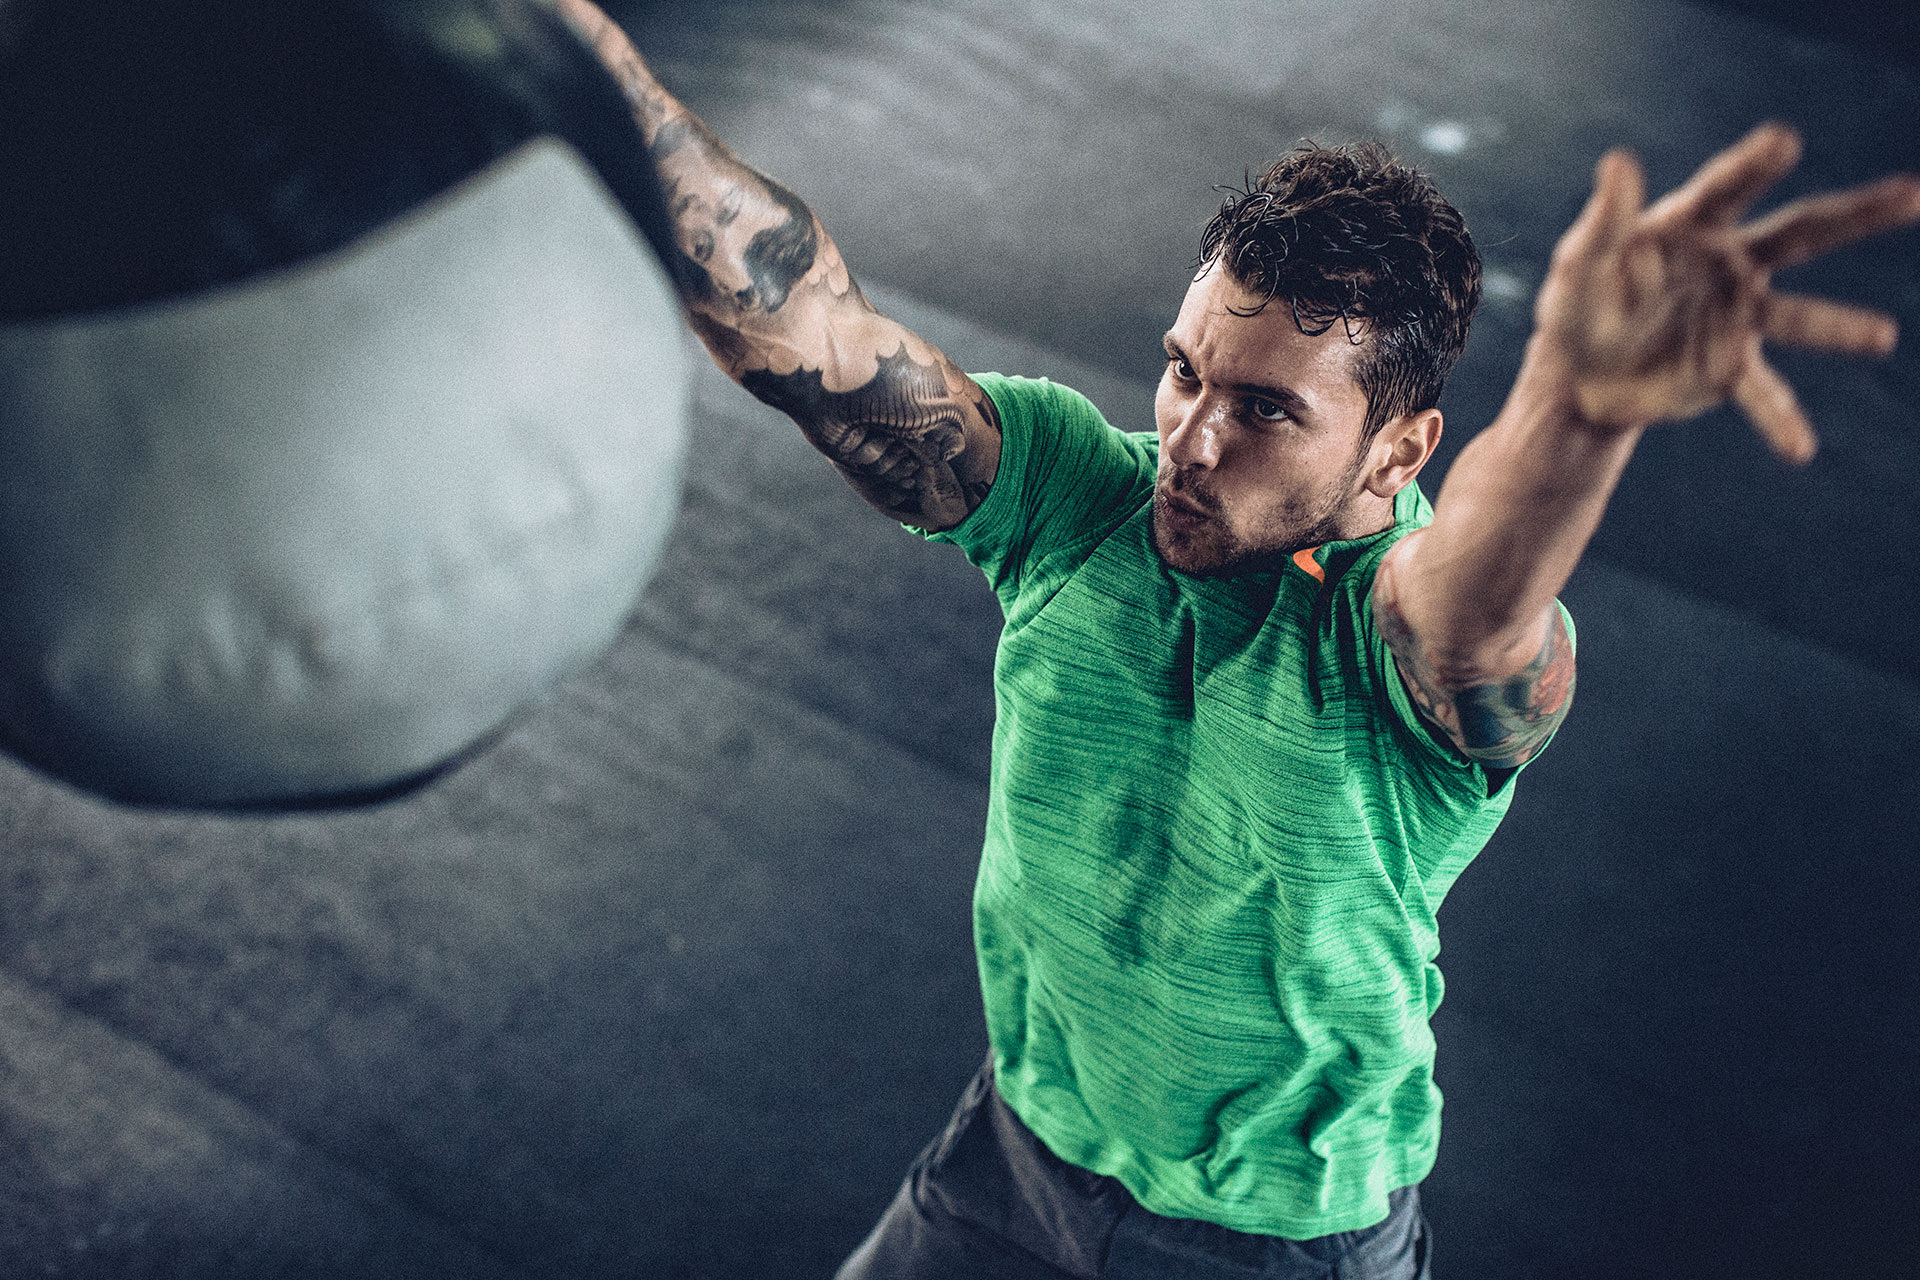 Aktion Gewicht Fotoproduktion Michael Müller Sport Lifestyle Fitness London UK